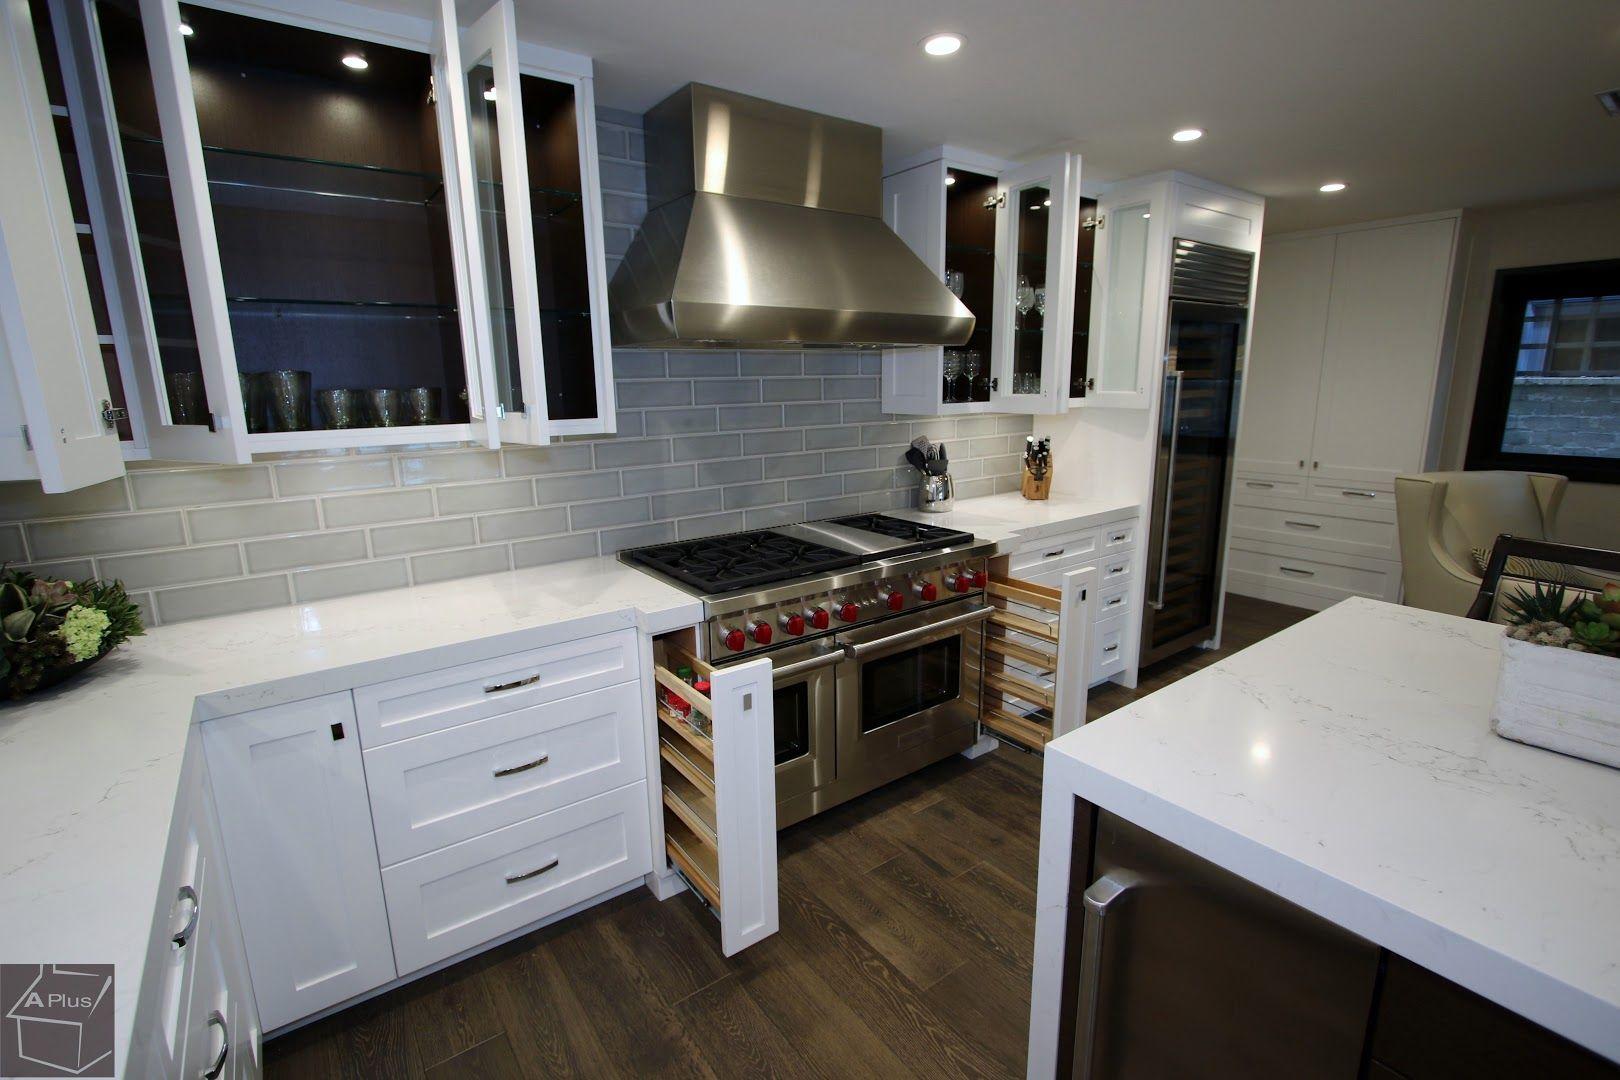 #whitecabinets #KitchenRemodel in Newport Beach #OrangeCounty